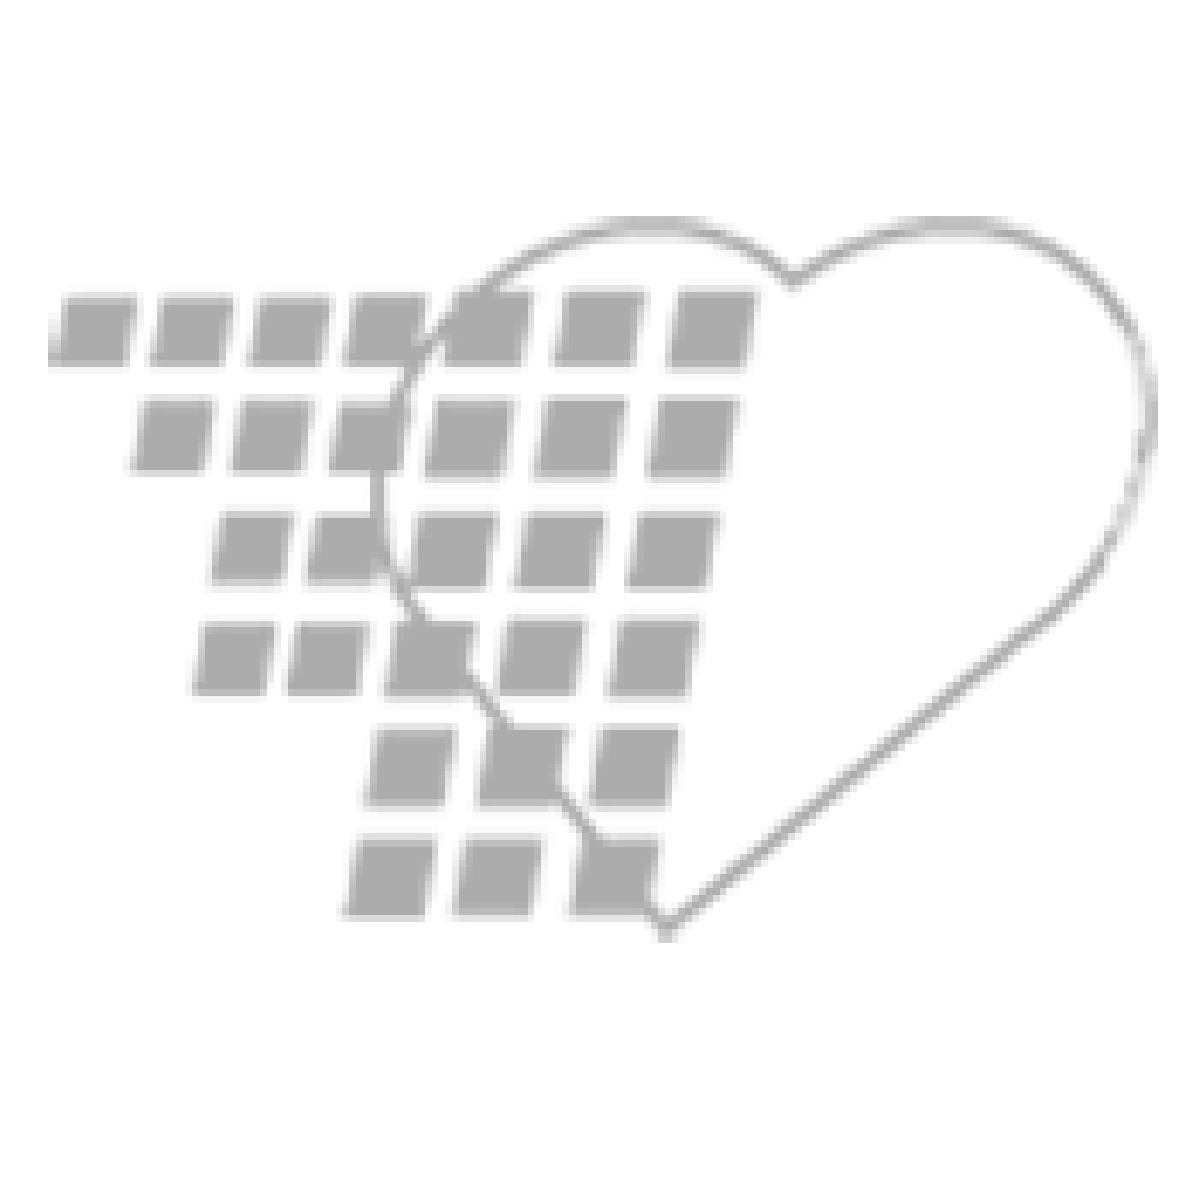 "06-21-5838 - Saf-T-Intima Winged IV Catheter - 22G x 3/4"""